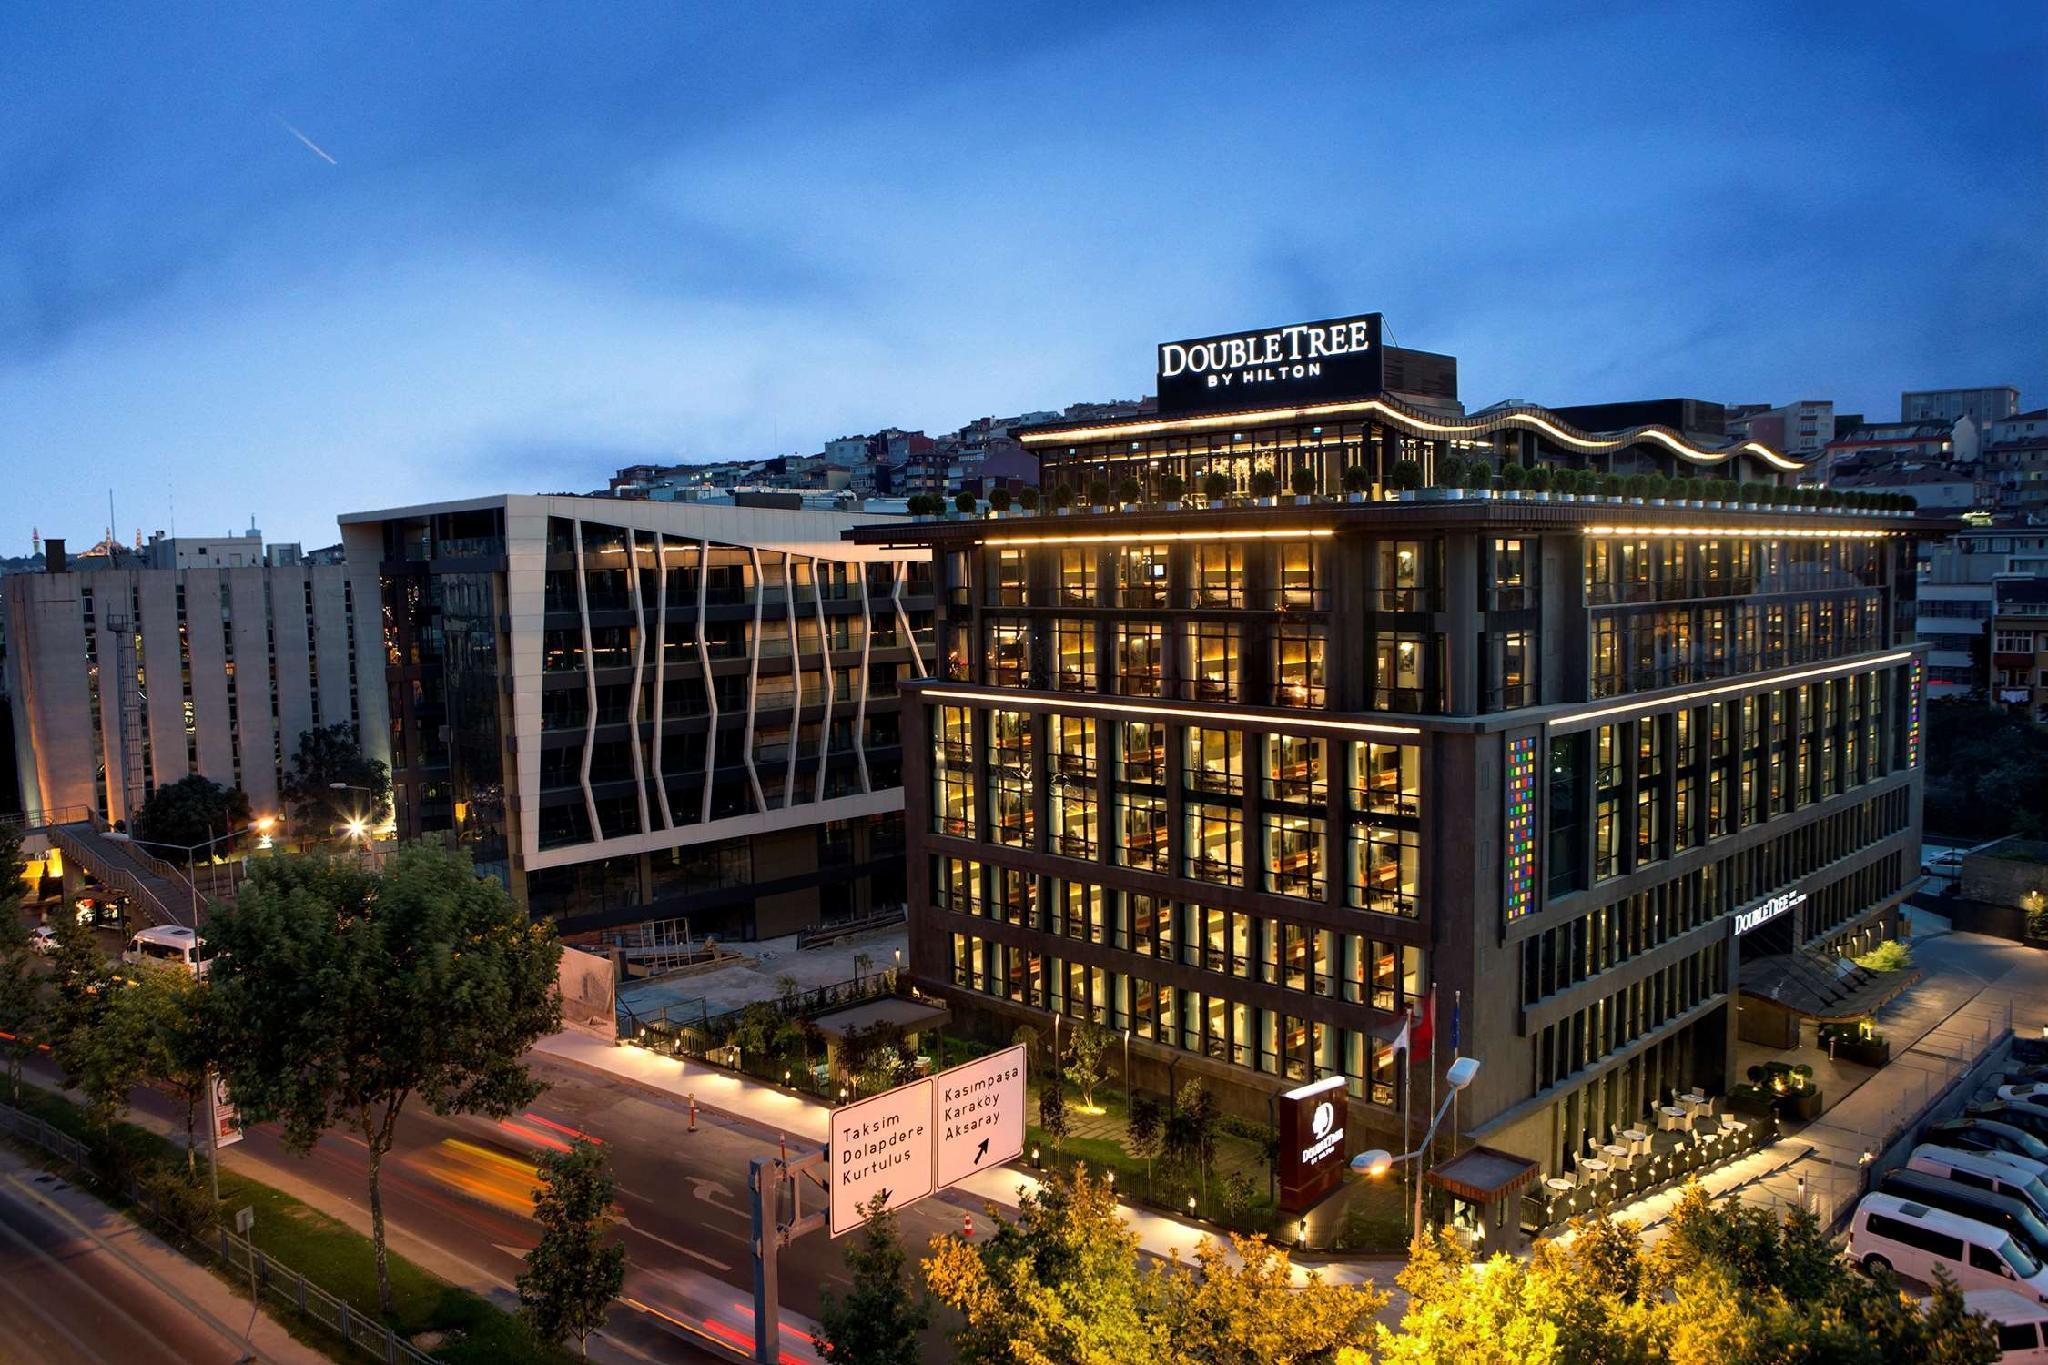 Double Tree By Hilton Hotel Istanbul Piyalepasa